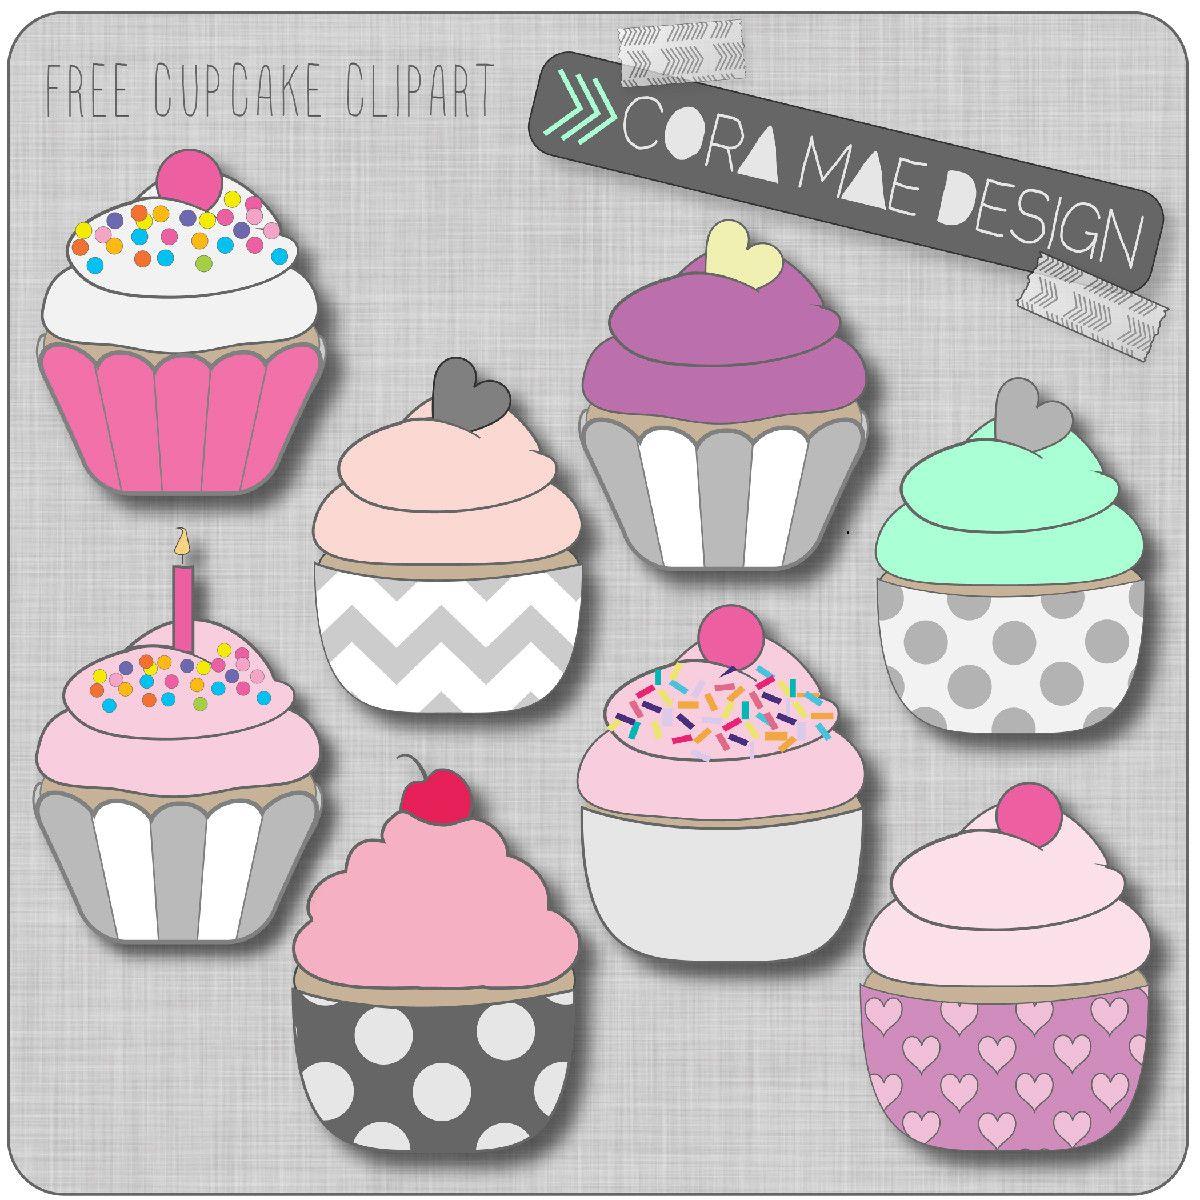 Cupcake clipart scrapbook. Free printable for junk